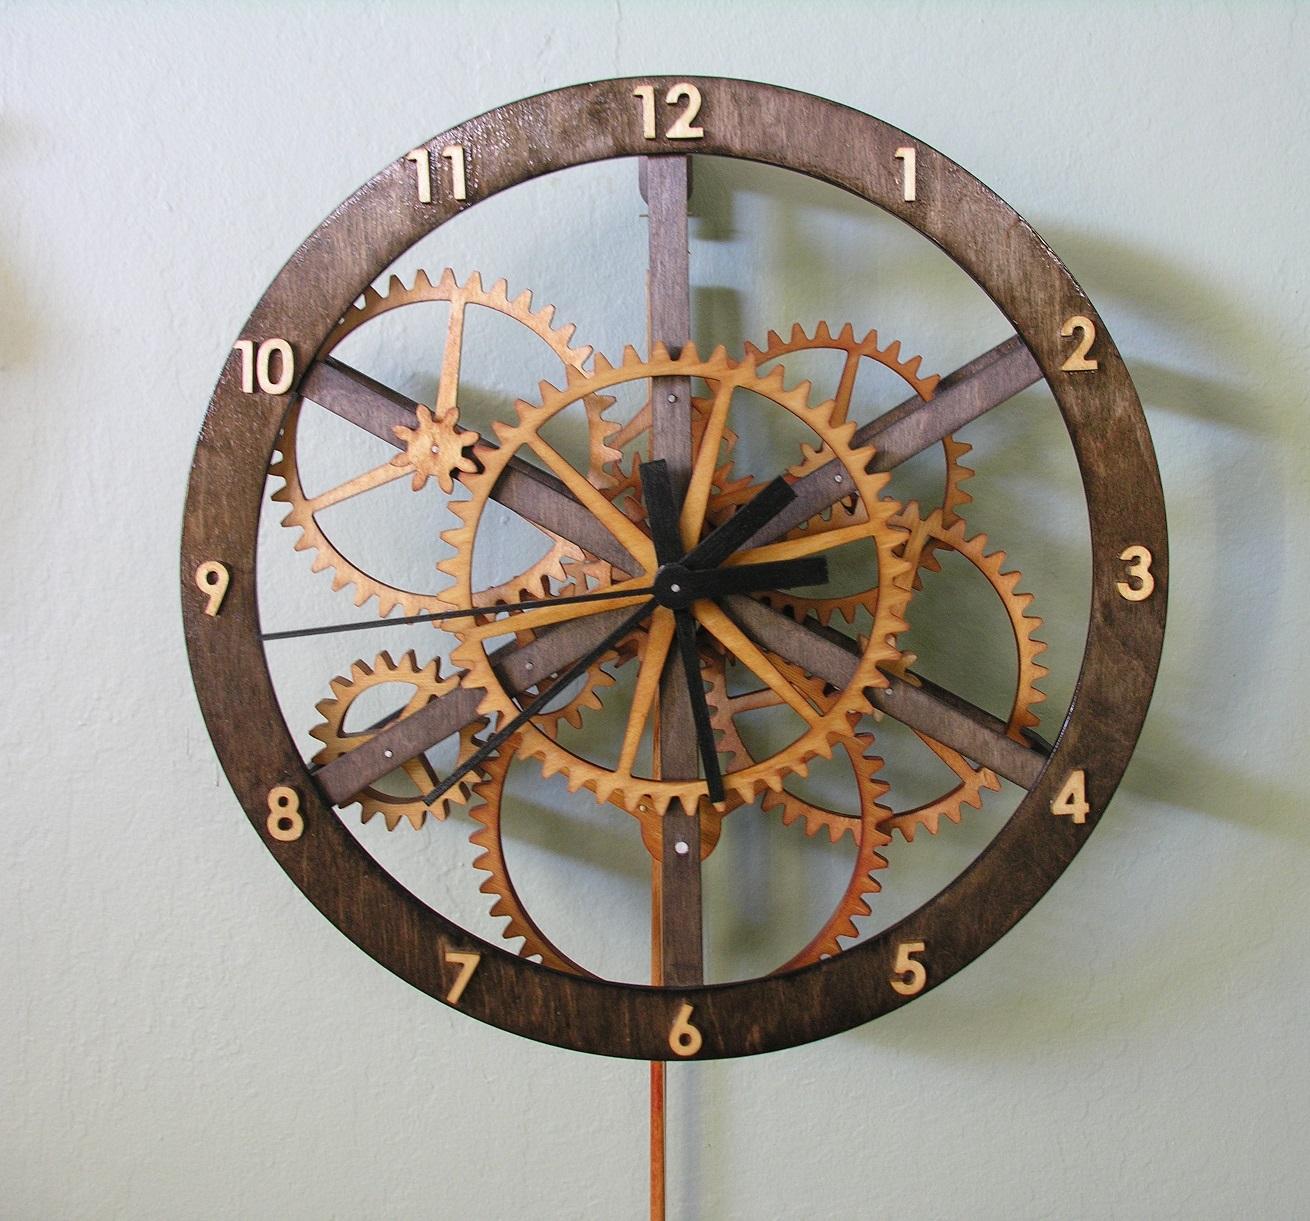 simple wooden clock plans wooden gear clock plans pdf wooden gear ...